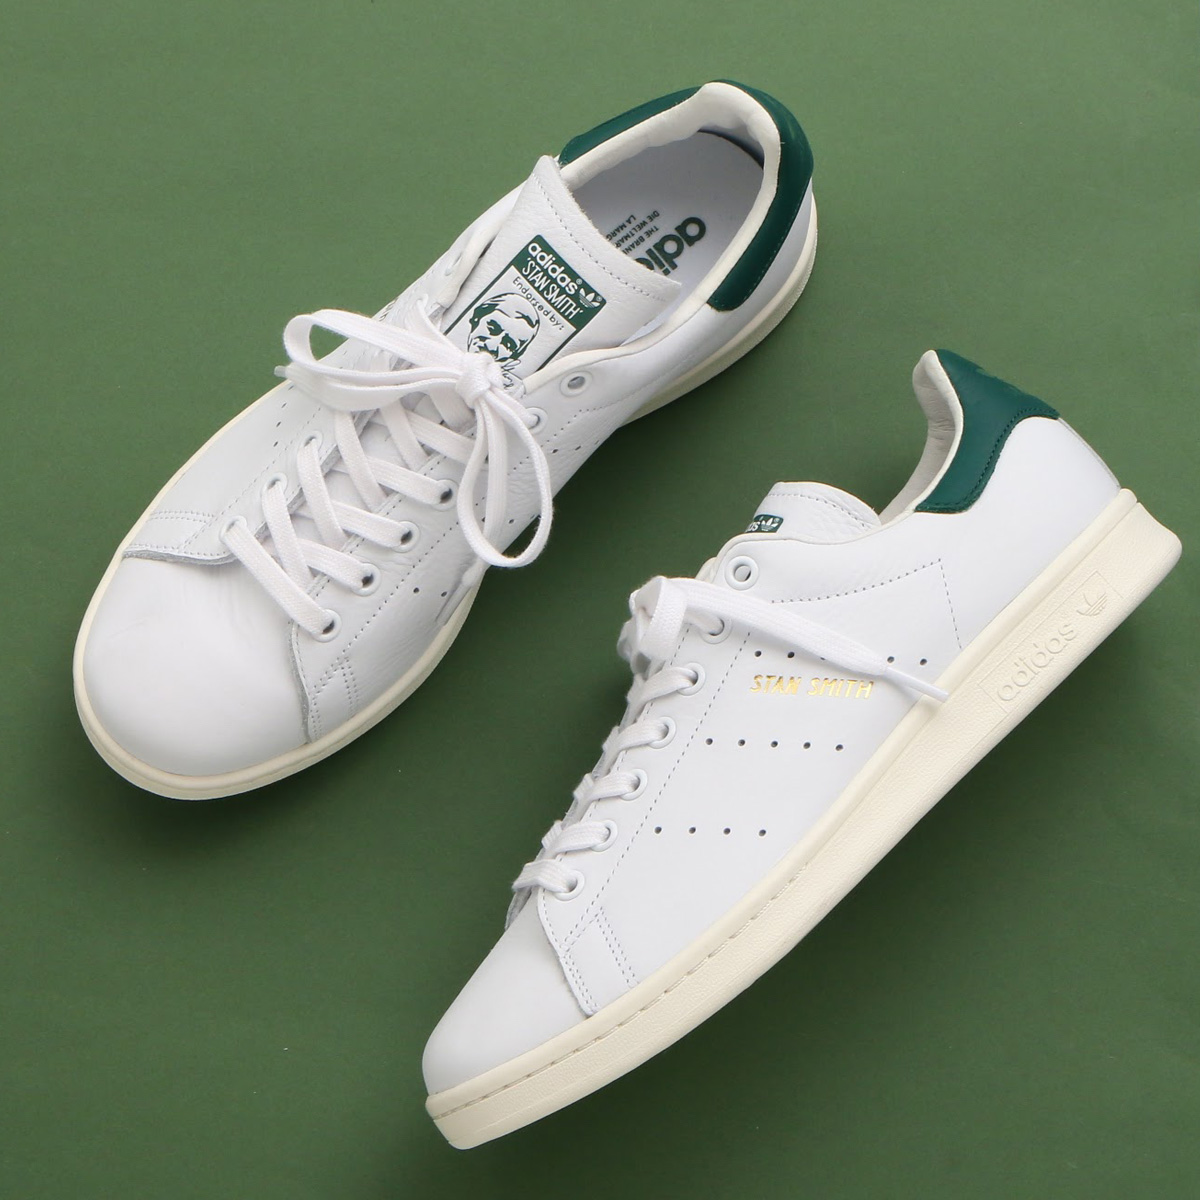 adidas Originals STAN SMITH (アディダス オリジナルス スタンスミス)Running White/Running White/Collegiate Green【メンズ レディース スニーカー】19SS-I